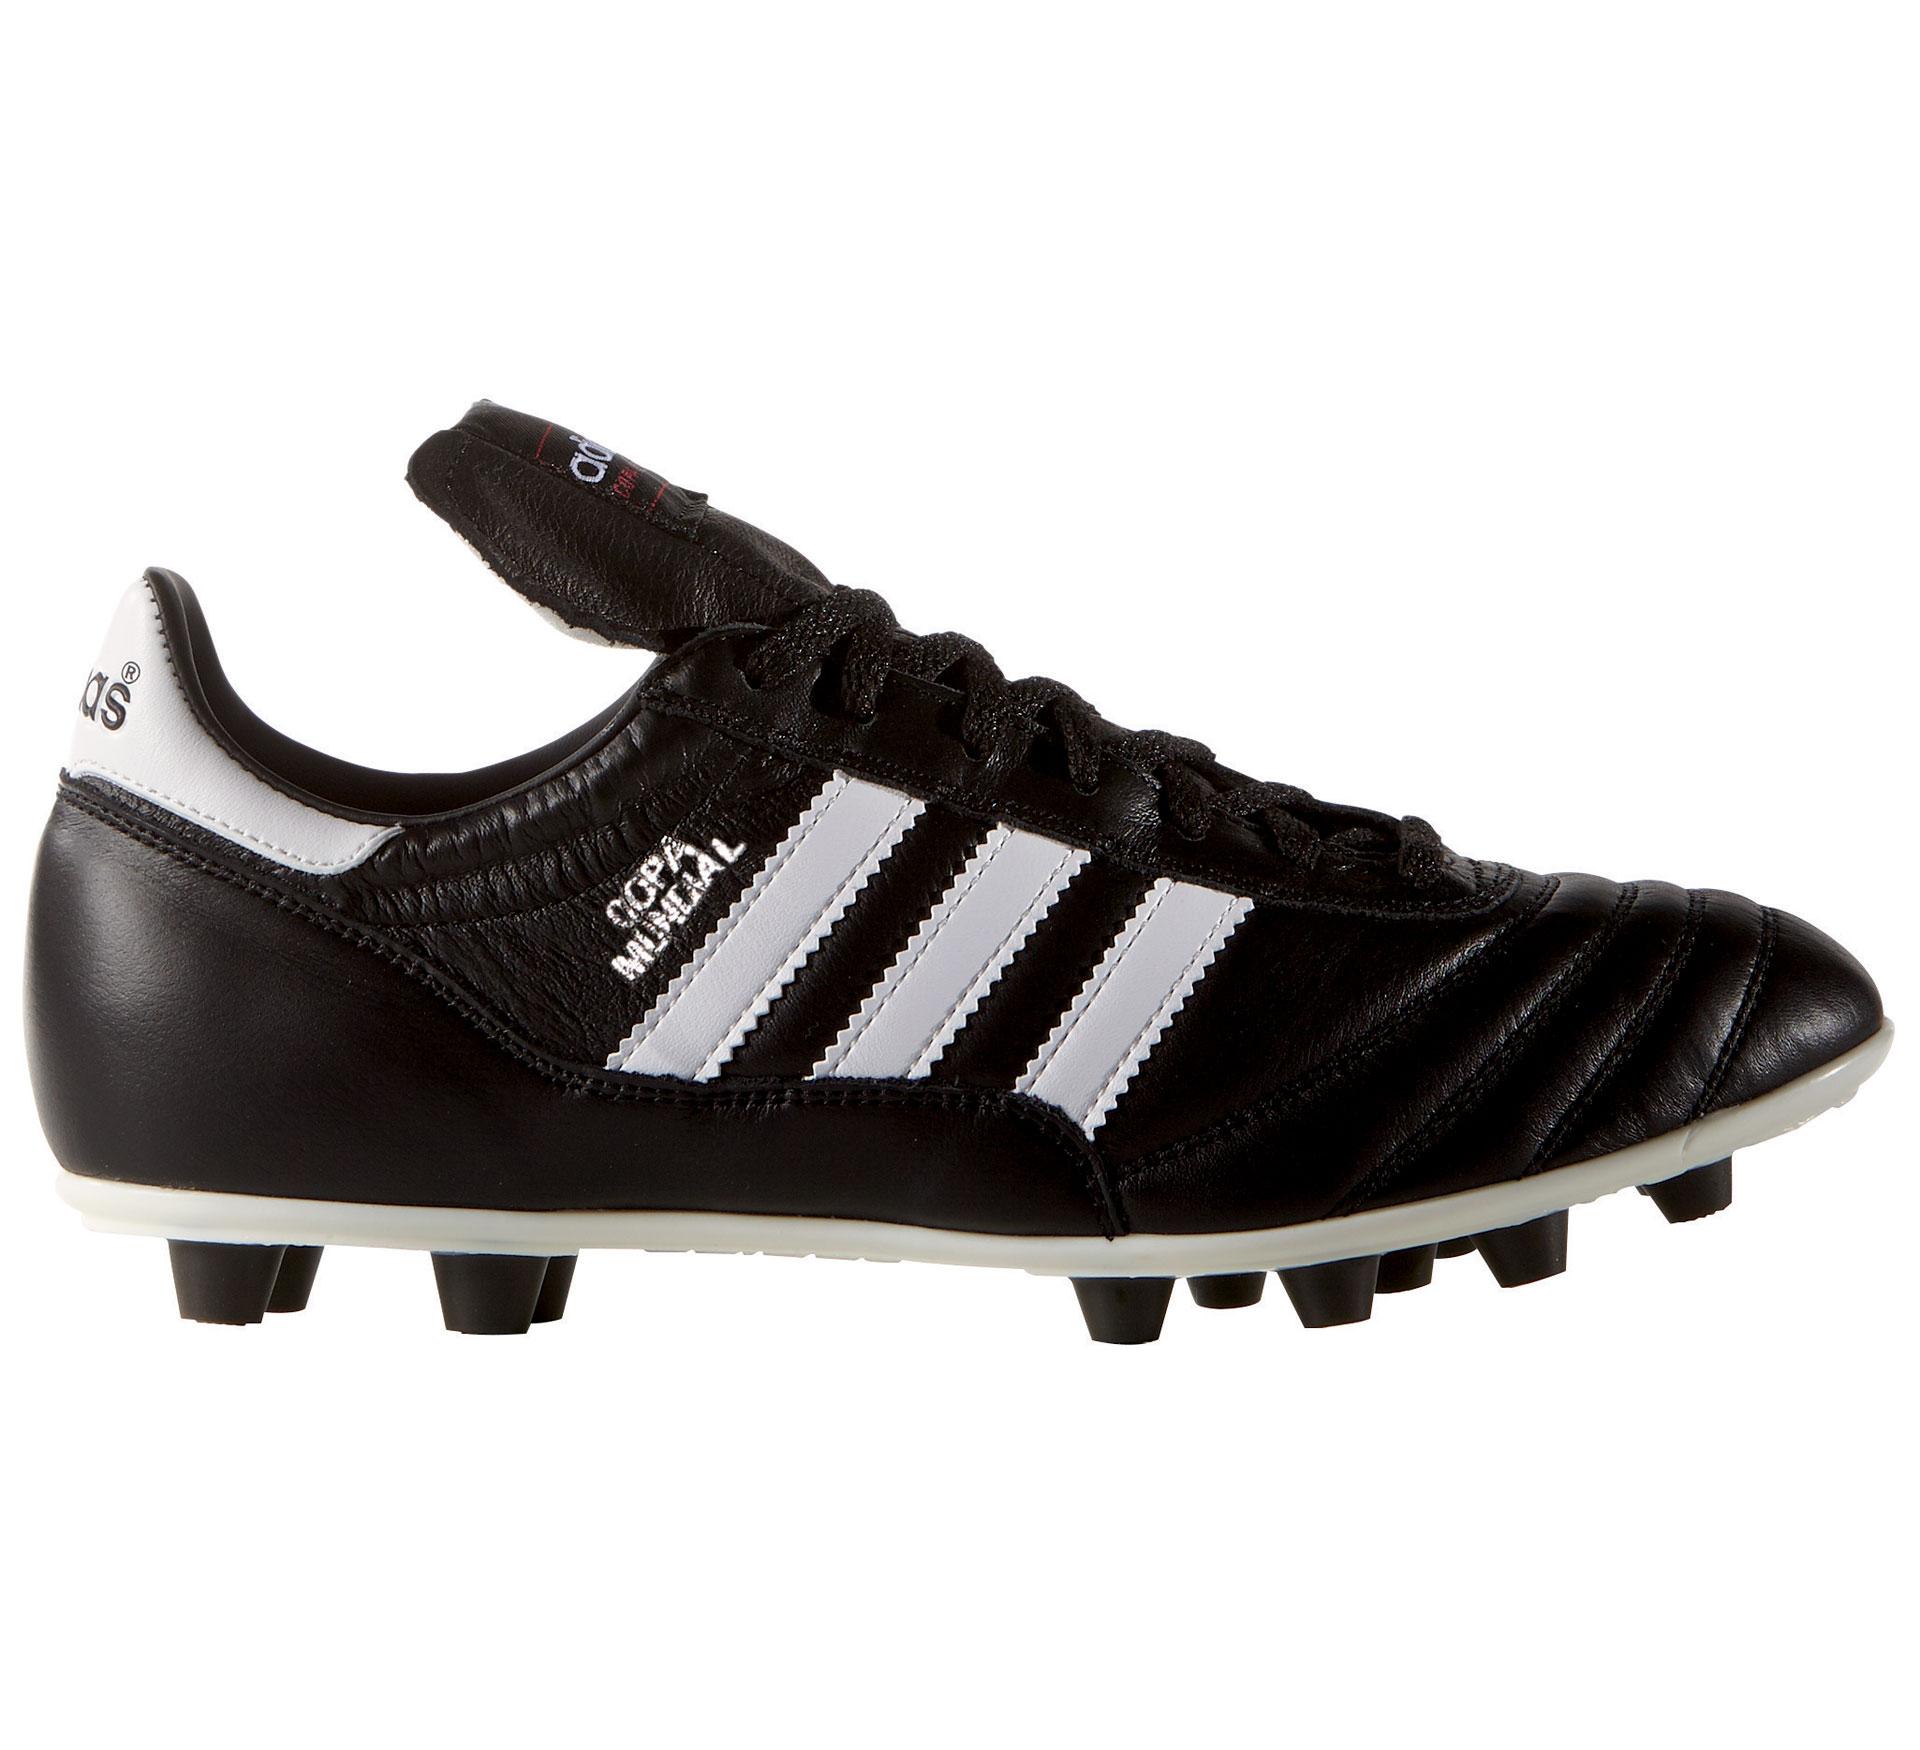 Chaussures de Football Adidas Copa Mundial FG Size: 48 pas cher